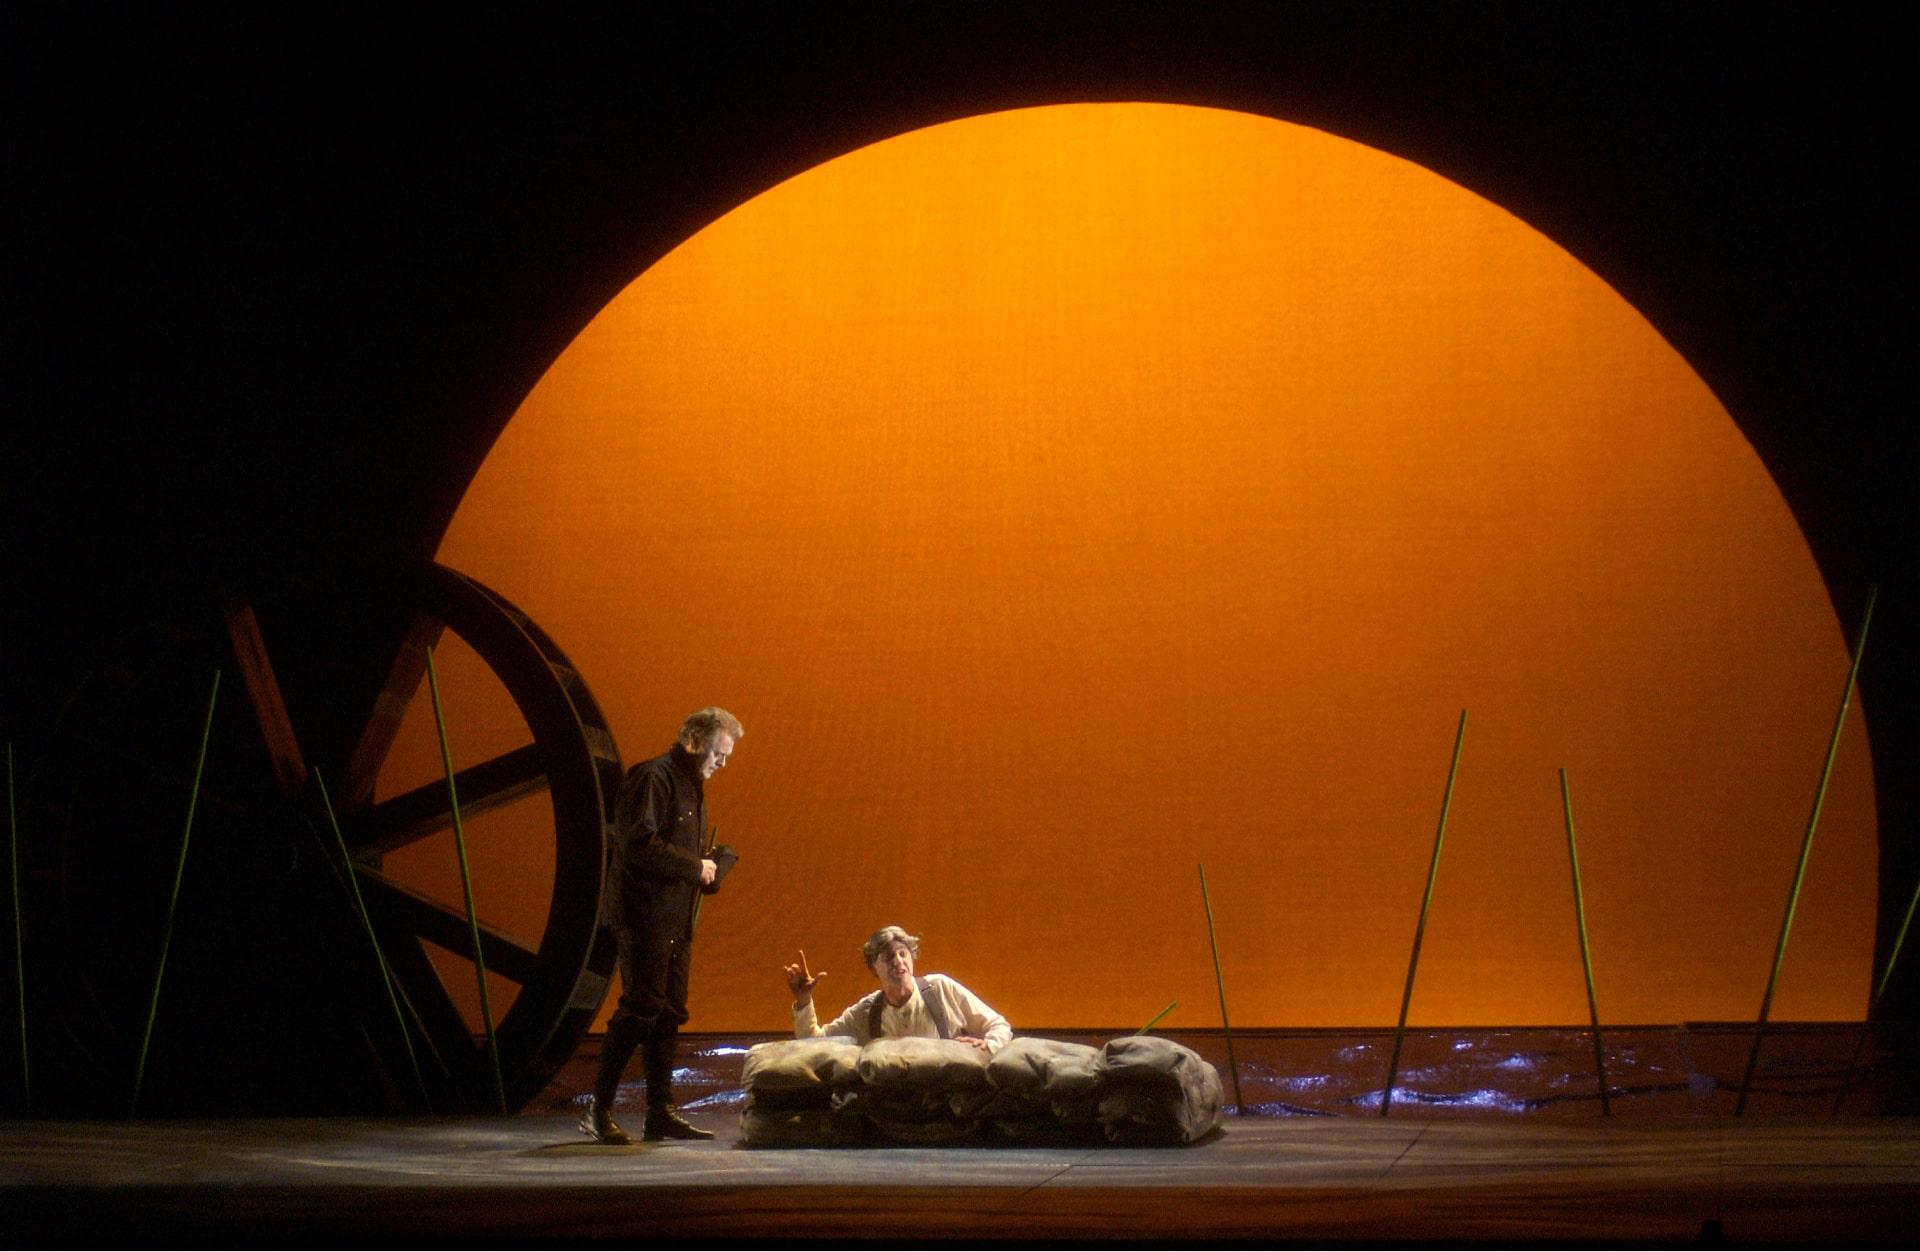 Man in black stands over man behind sandbags, against mill wheel and orange sunrise.